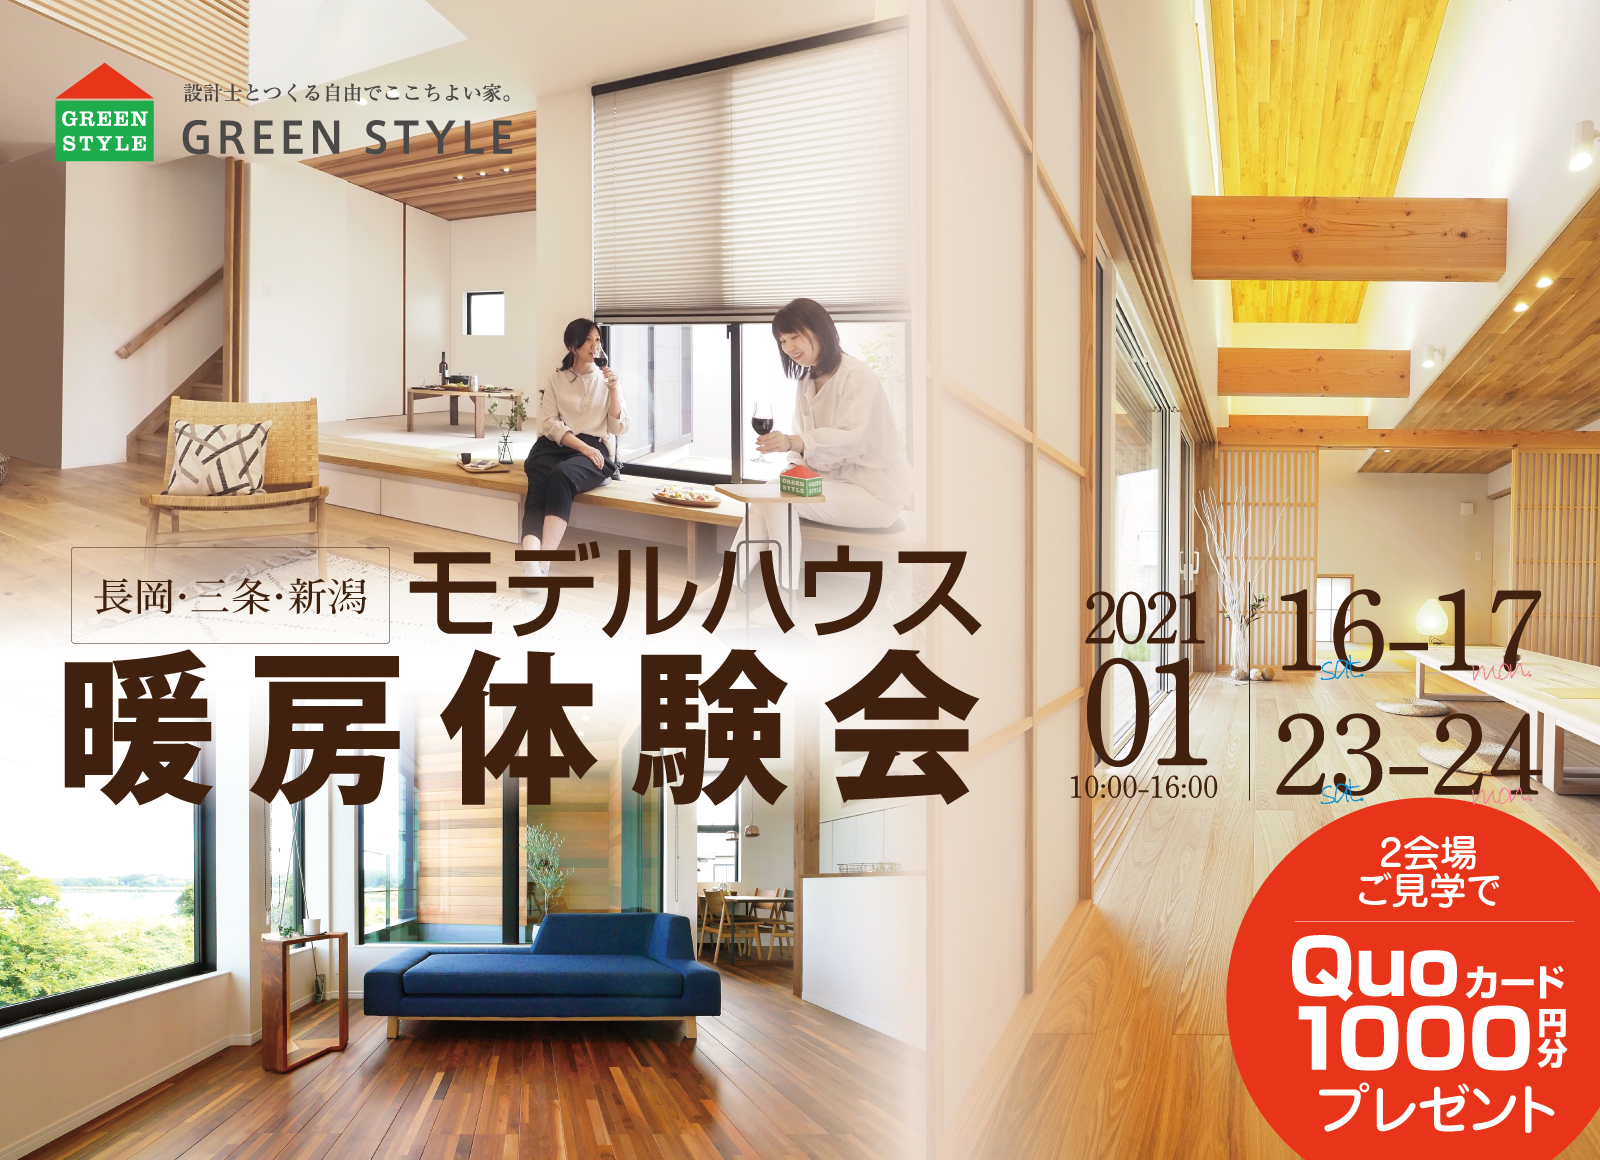 GreenStyle 長岡・三条・新潟モデルハウス 暖房体験会 2021/01/16-17/23-24